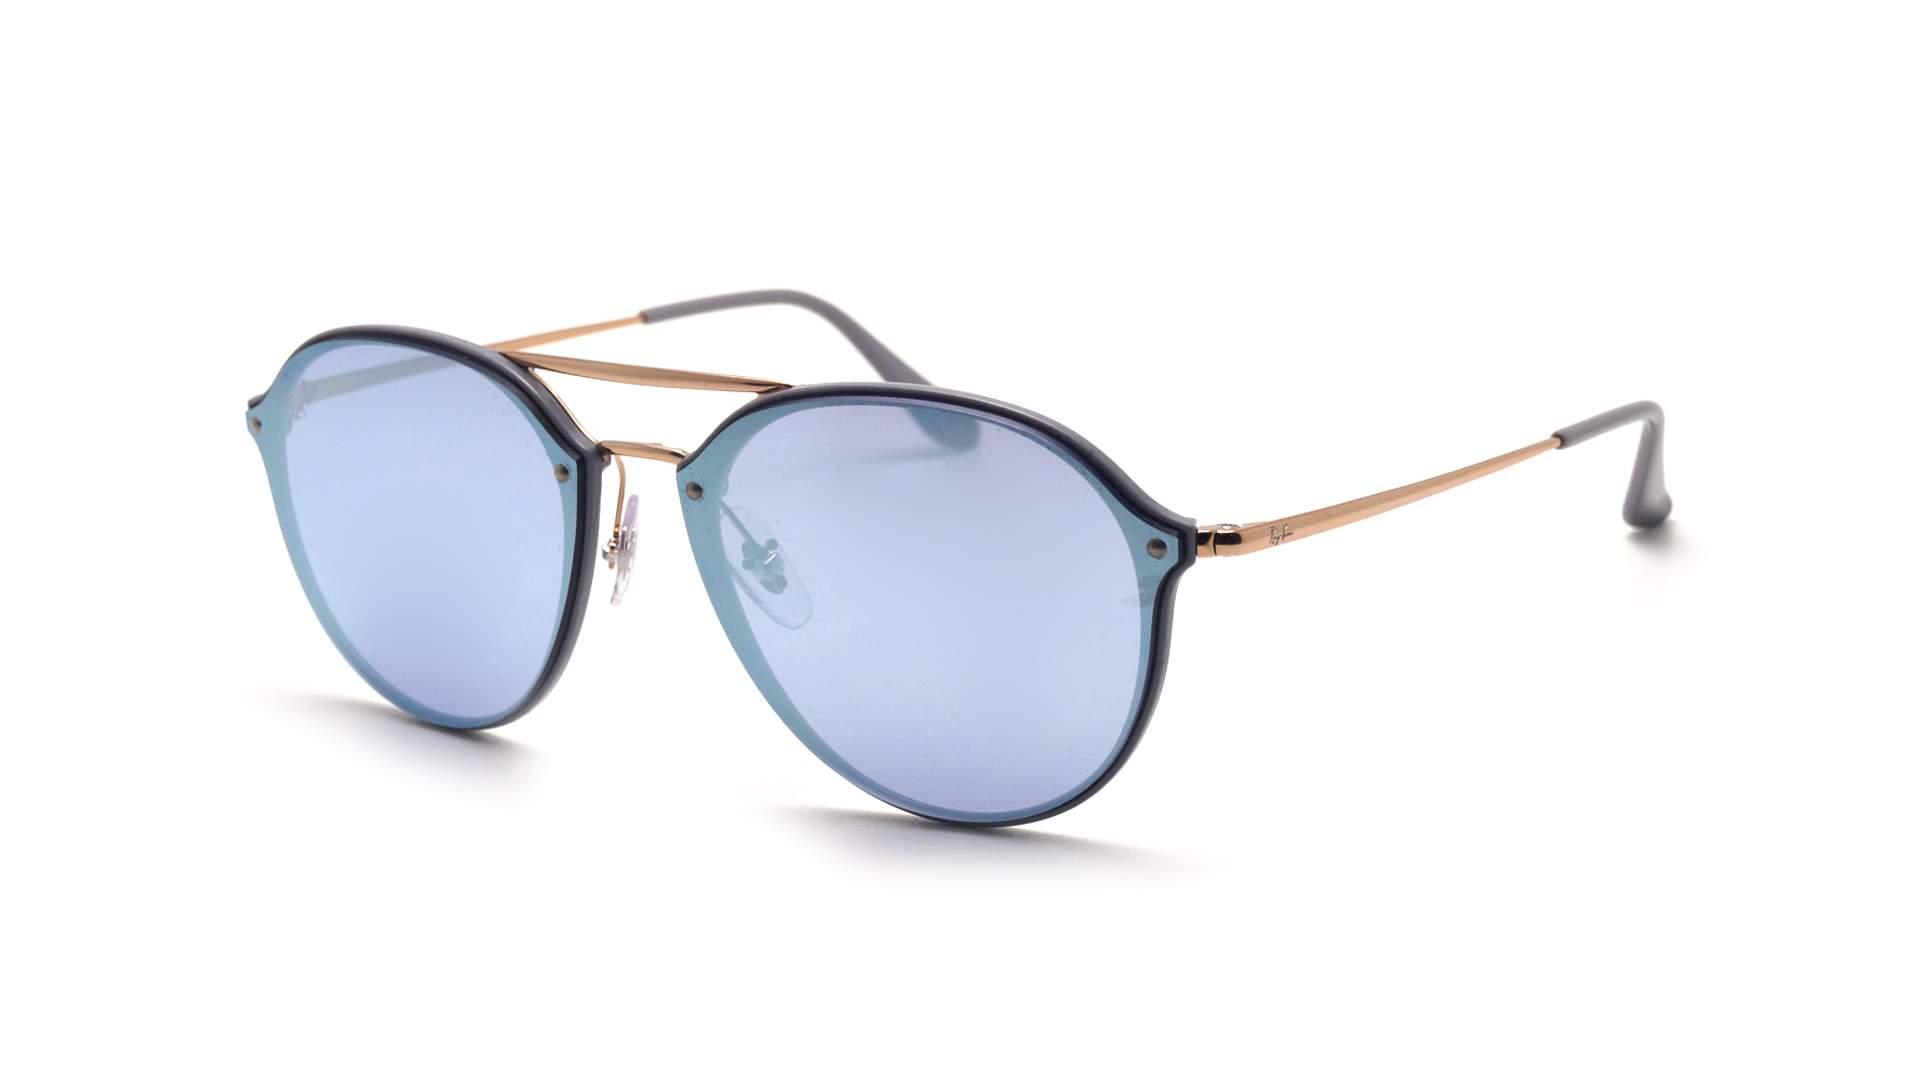 f2abc993f3a Sunglasses Ray-Ban Blaze Double Bridge Silver RB4292N 6326 1U 62-14 Large  Mirror